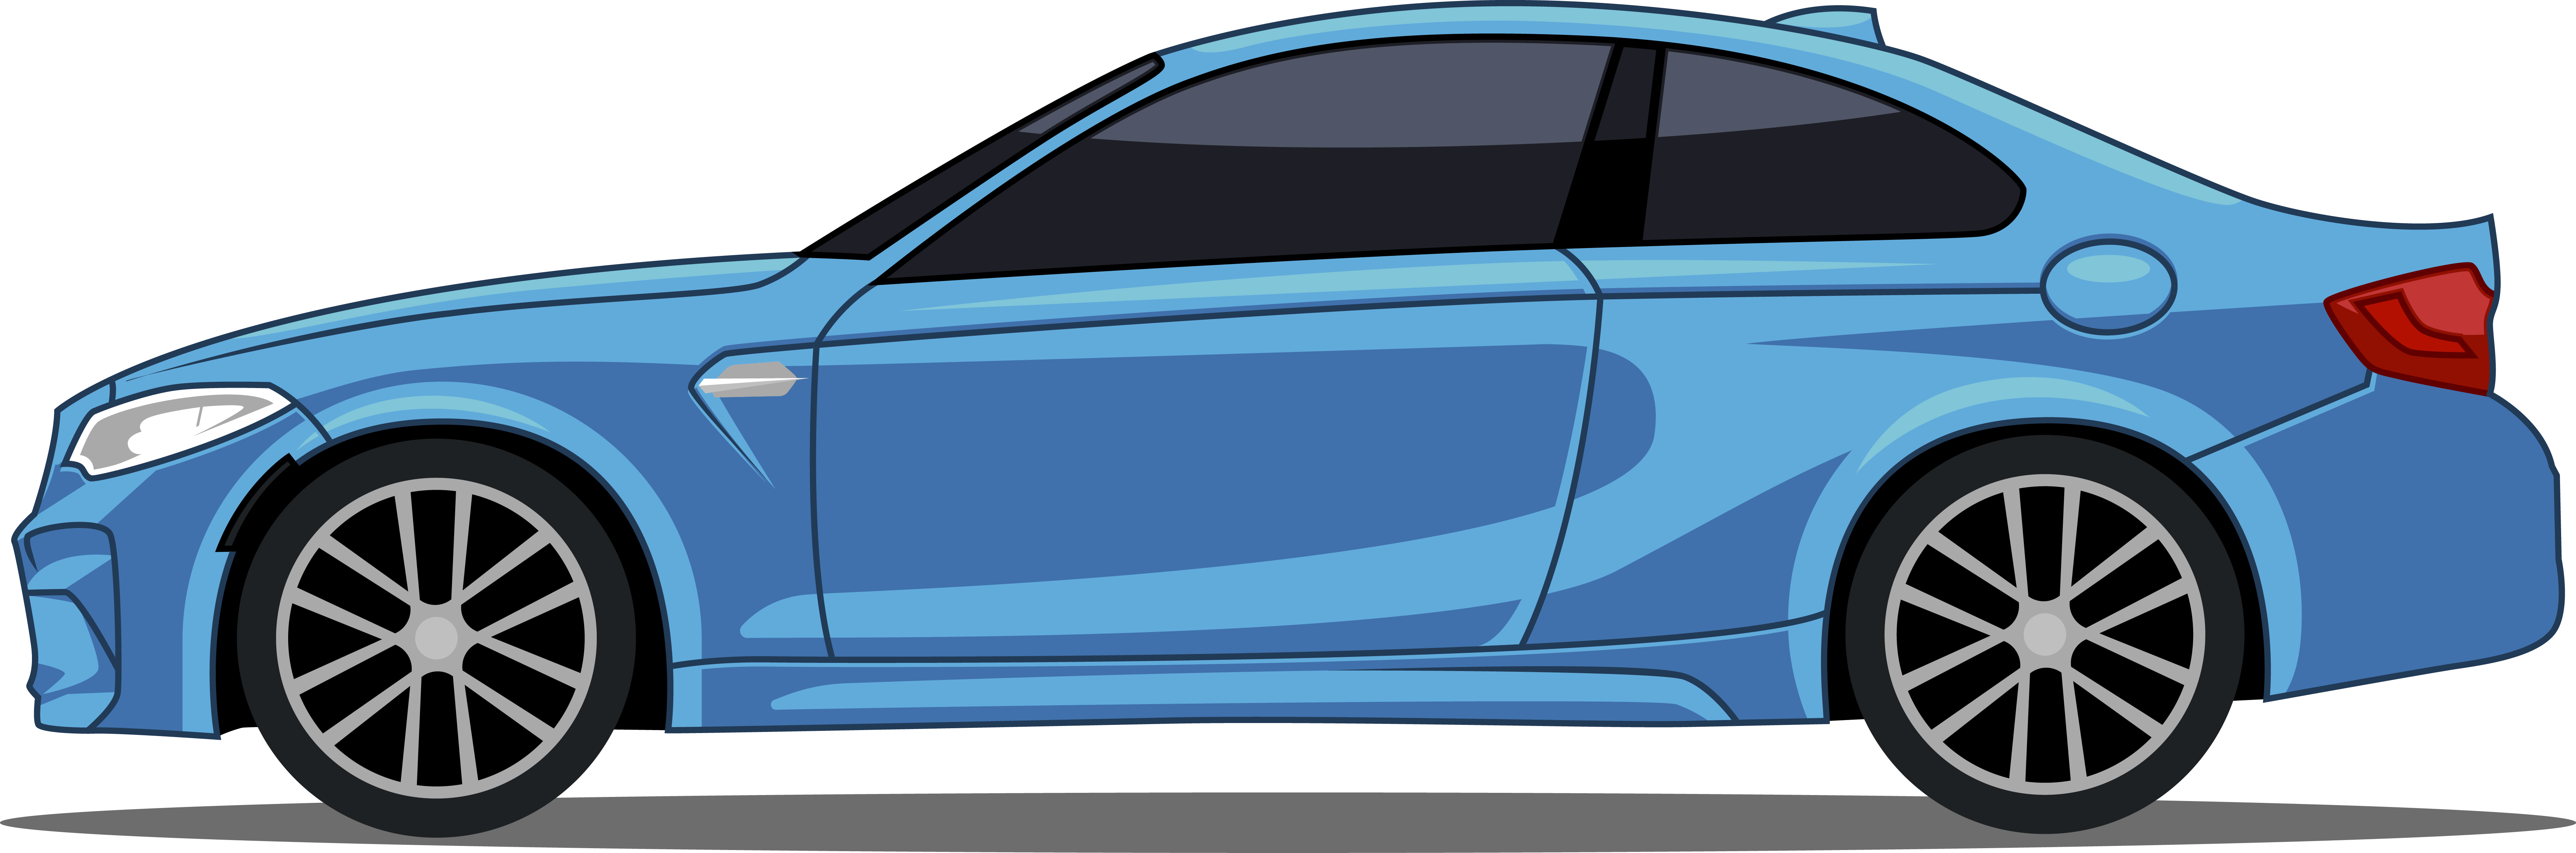 clipart Sports car Luxury vehicle Mercedes